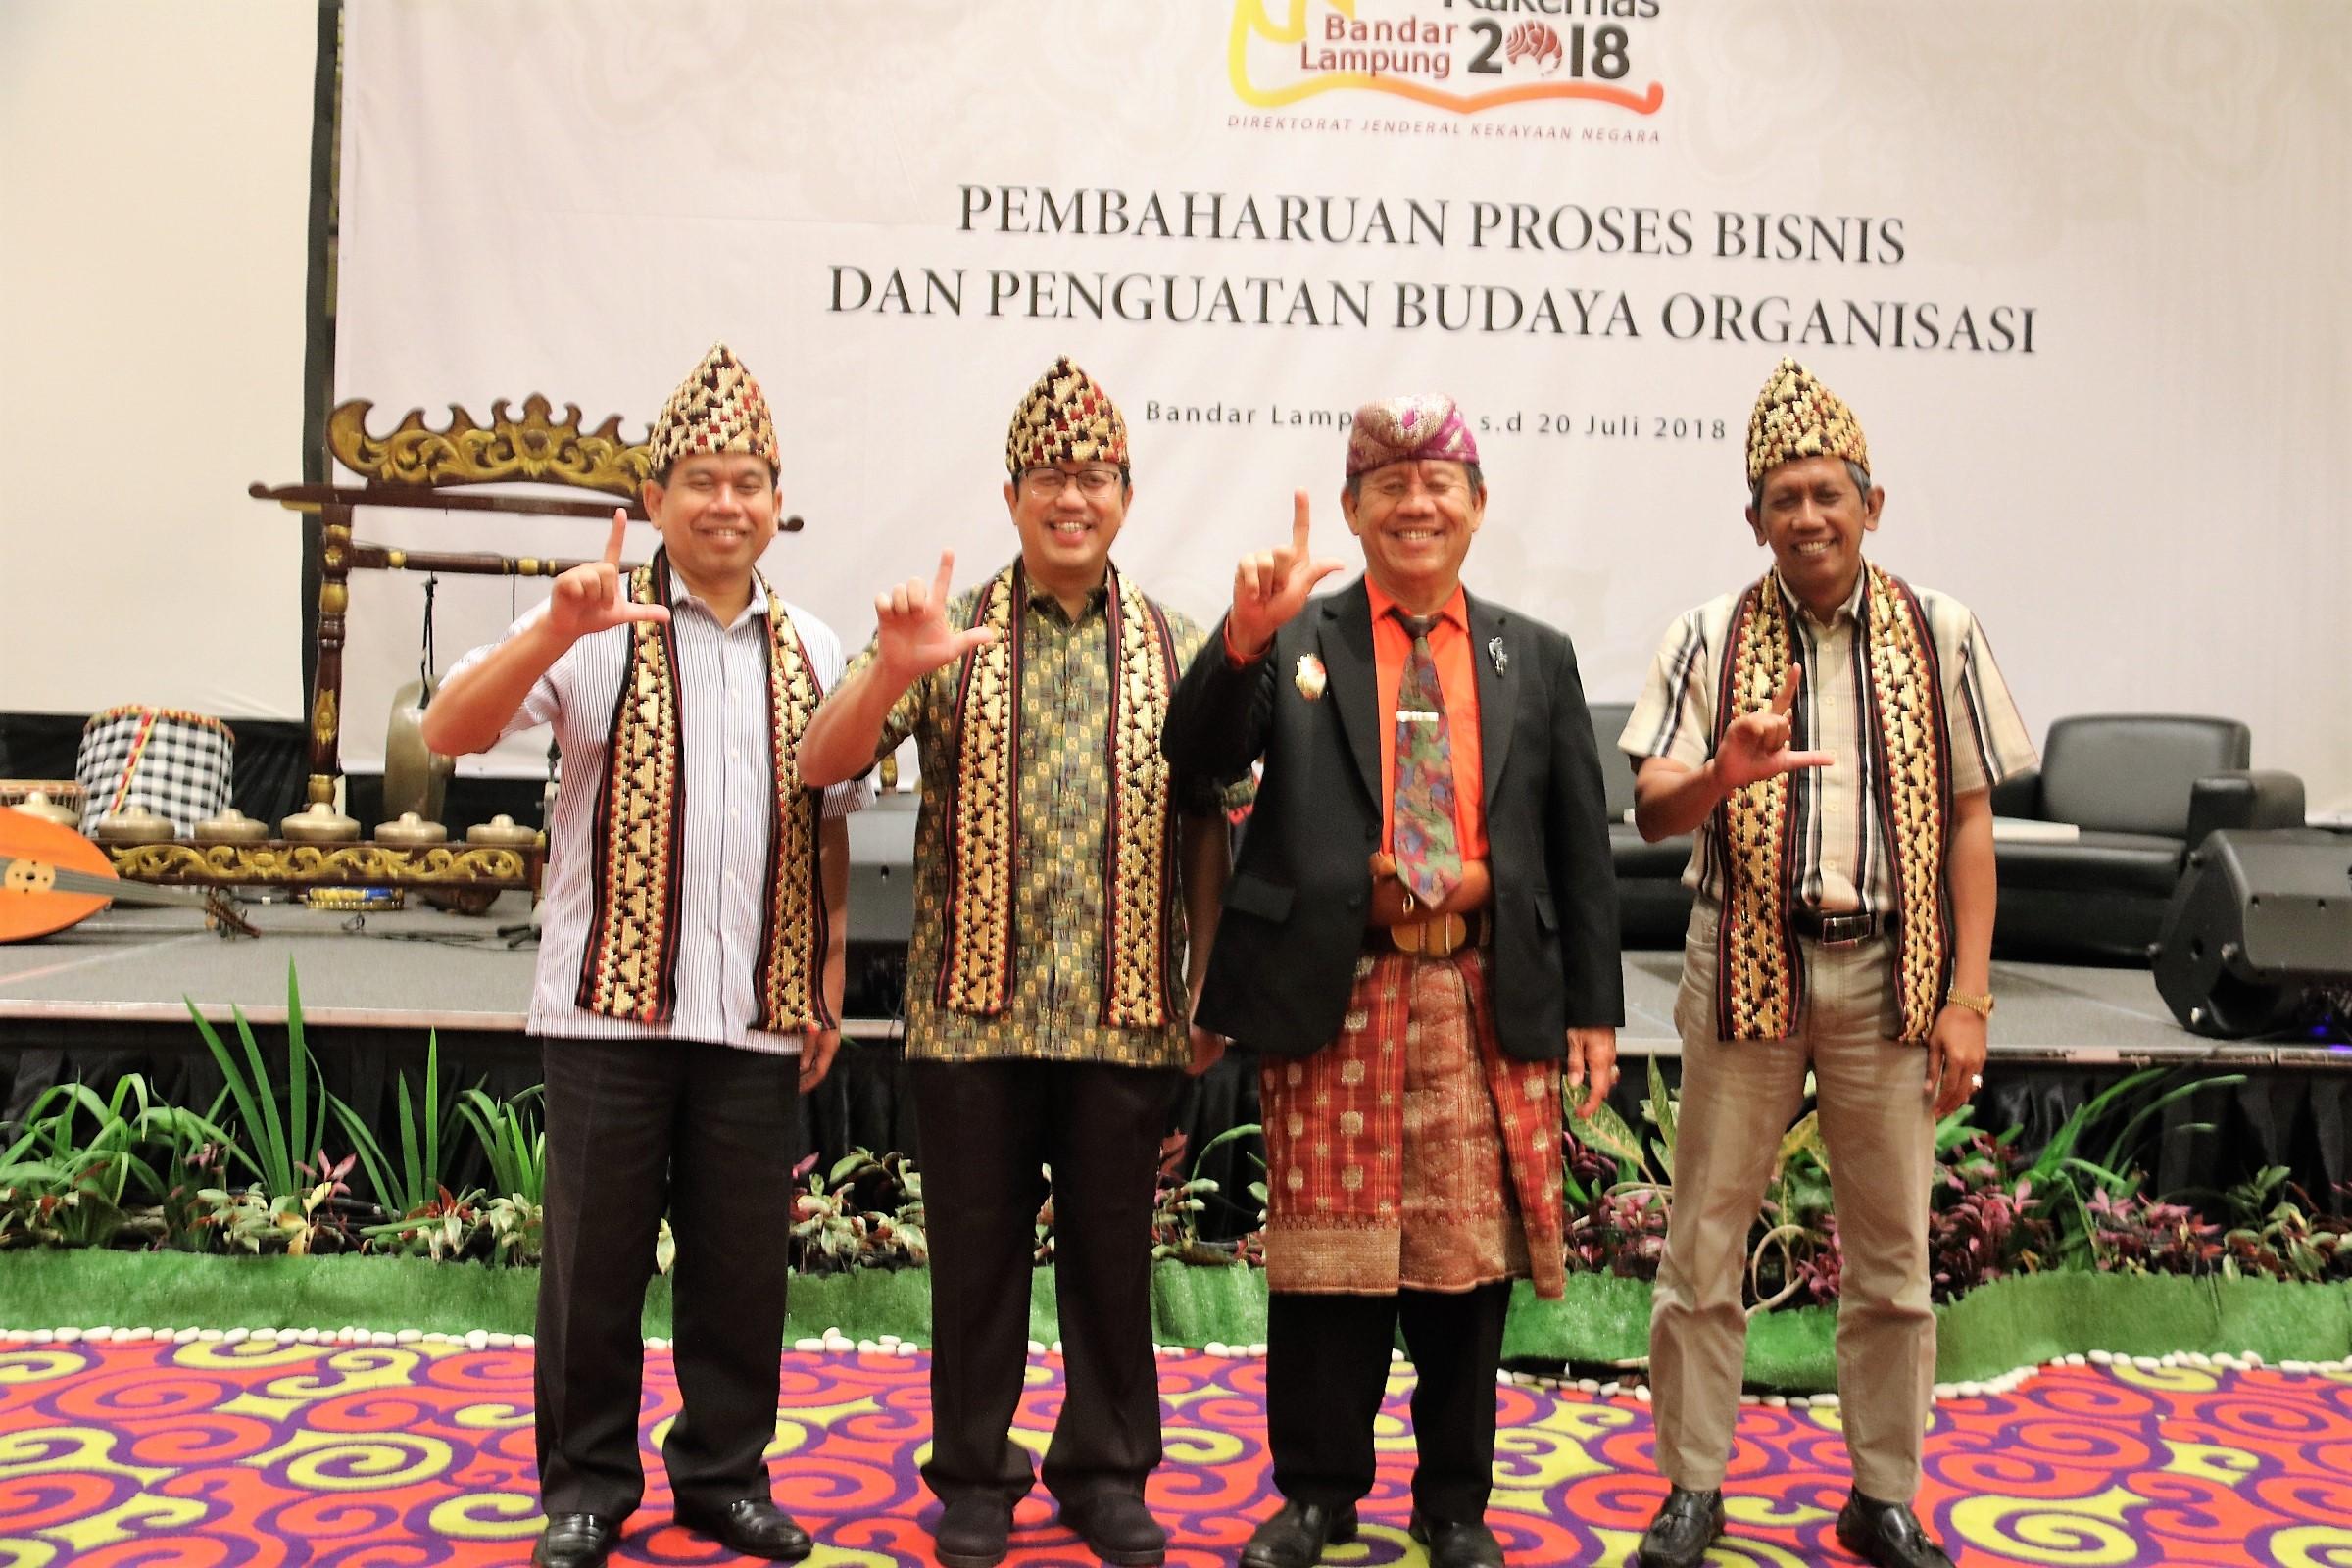 Lampung Sang Bumi Ruwa Jurai